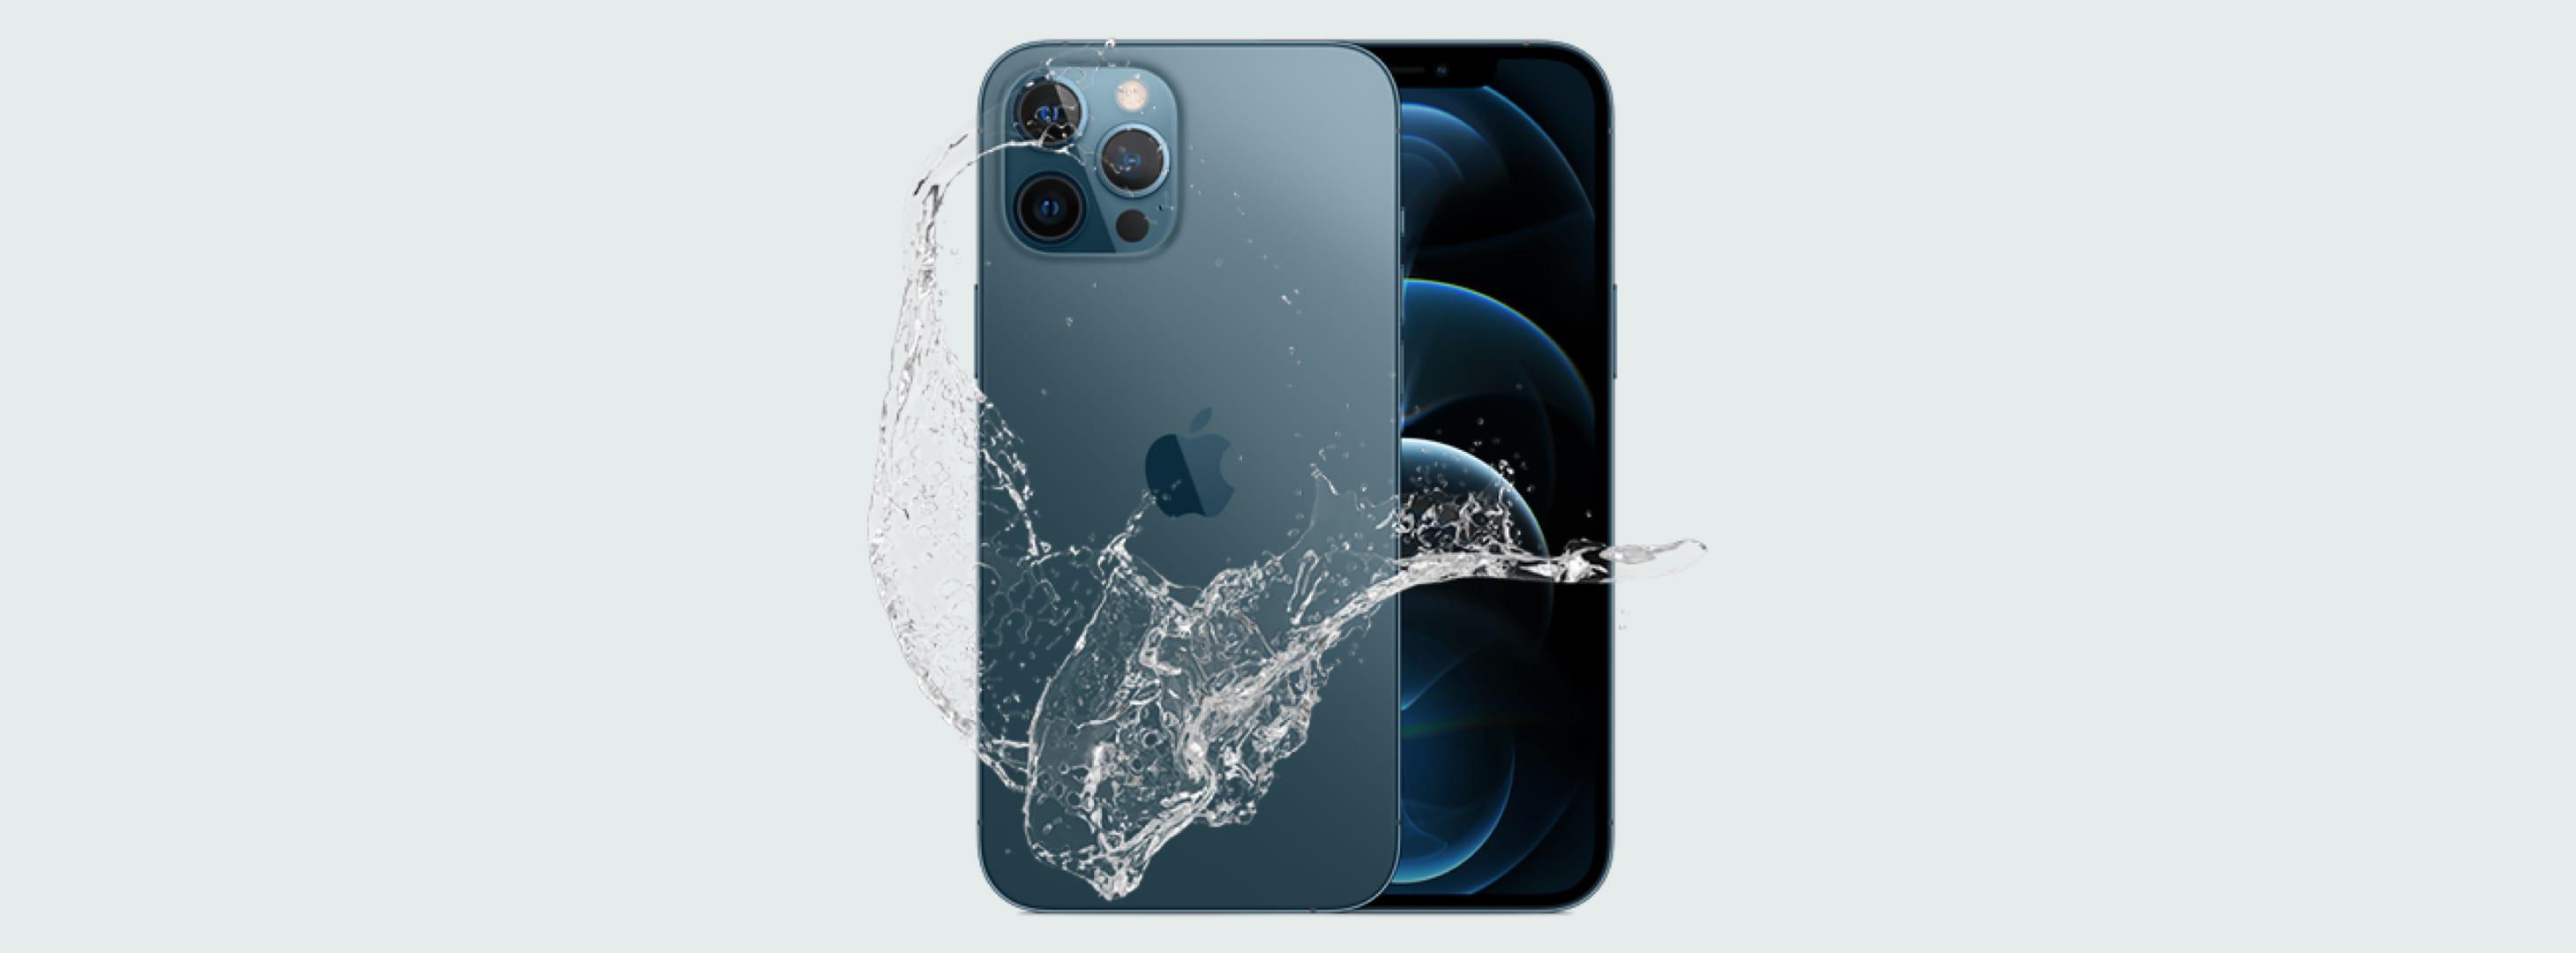 applenews-iphone-12-in-water